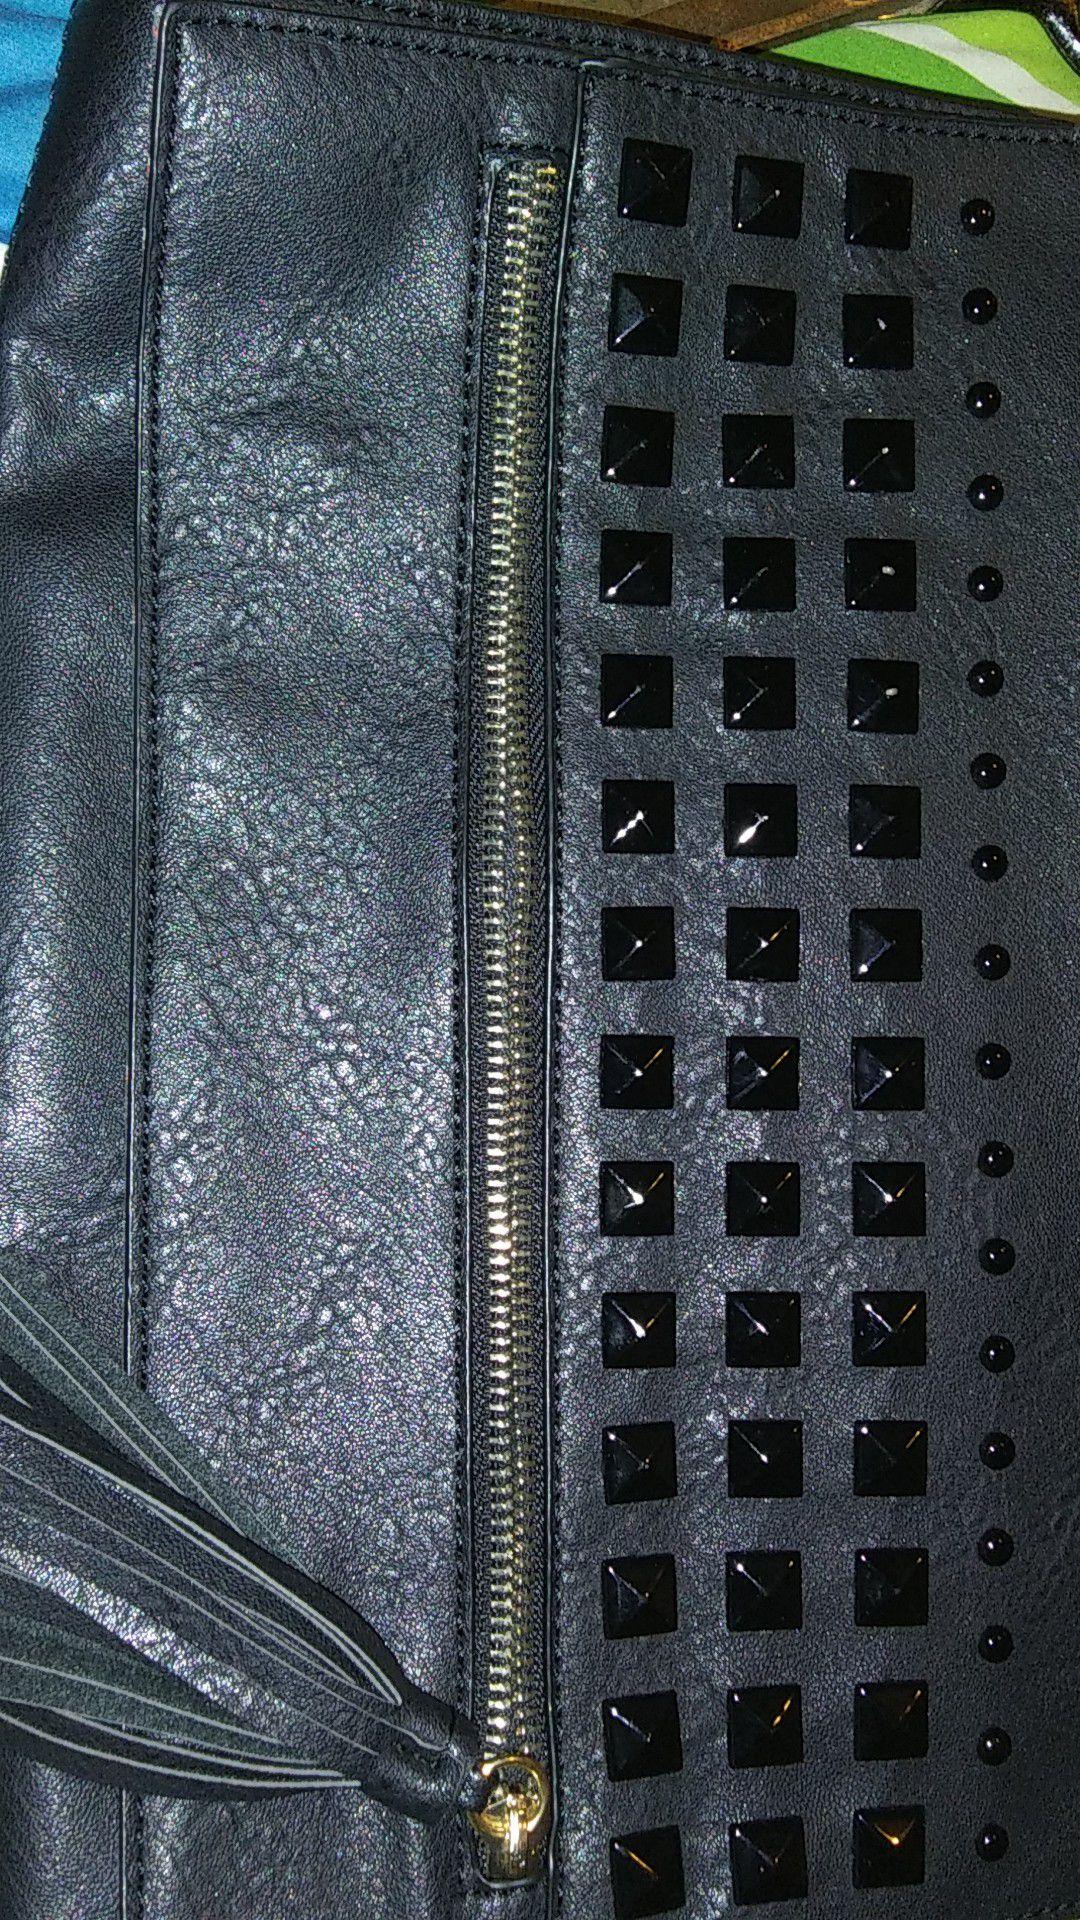 Cesca london New York handbag